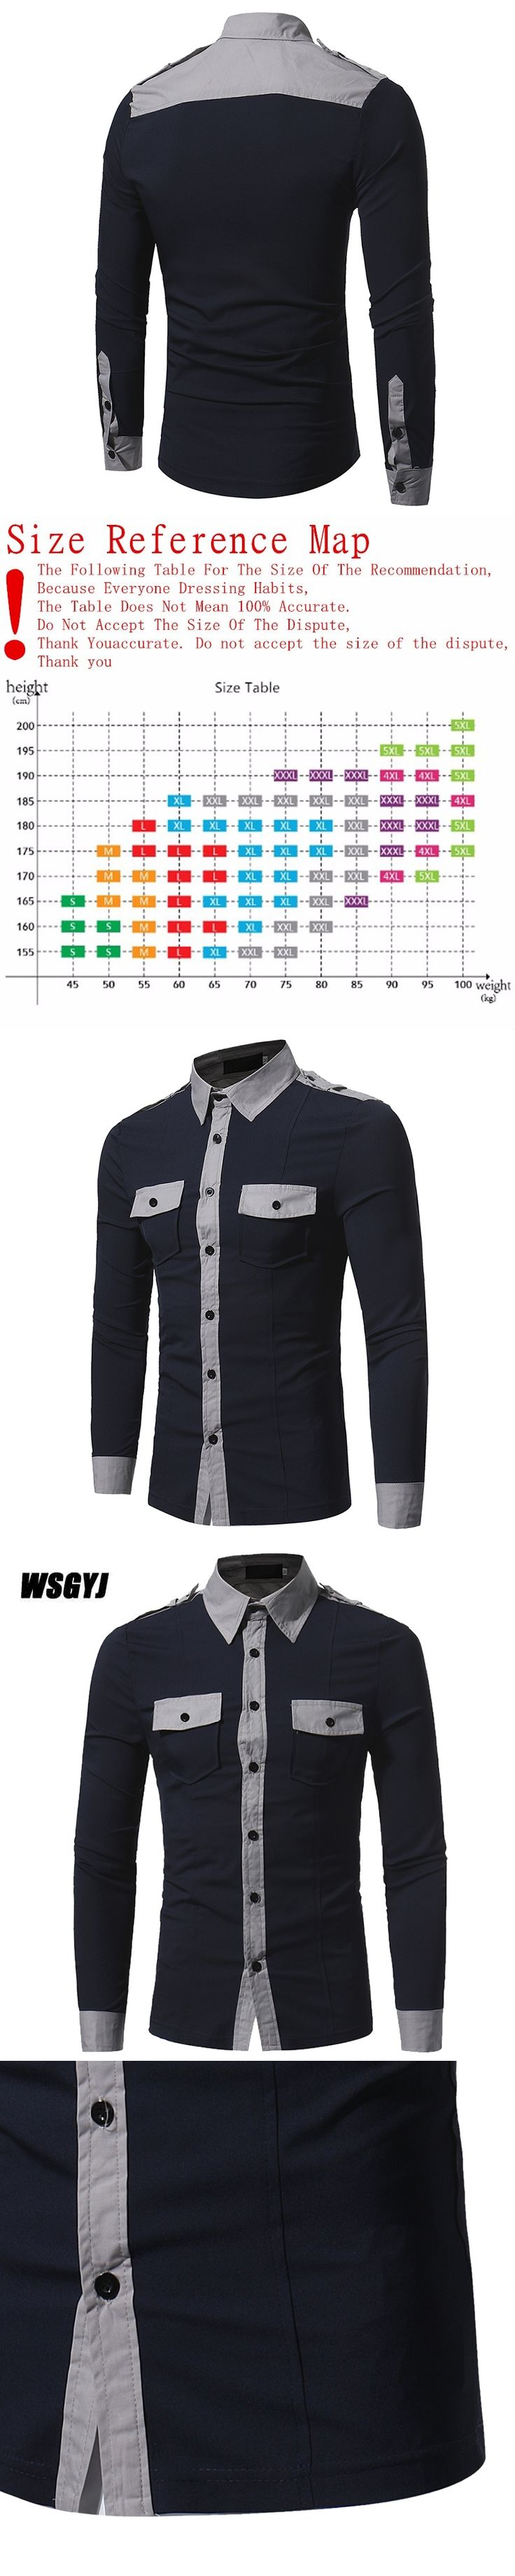 Camisa Social Masculina 2017 Fashion Brand Men'S Double Pocket Badges Male Long-Sleeved Shirt Casual Slim Camisa Social M-XXXL